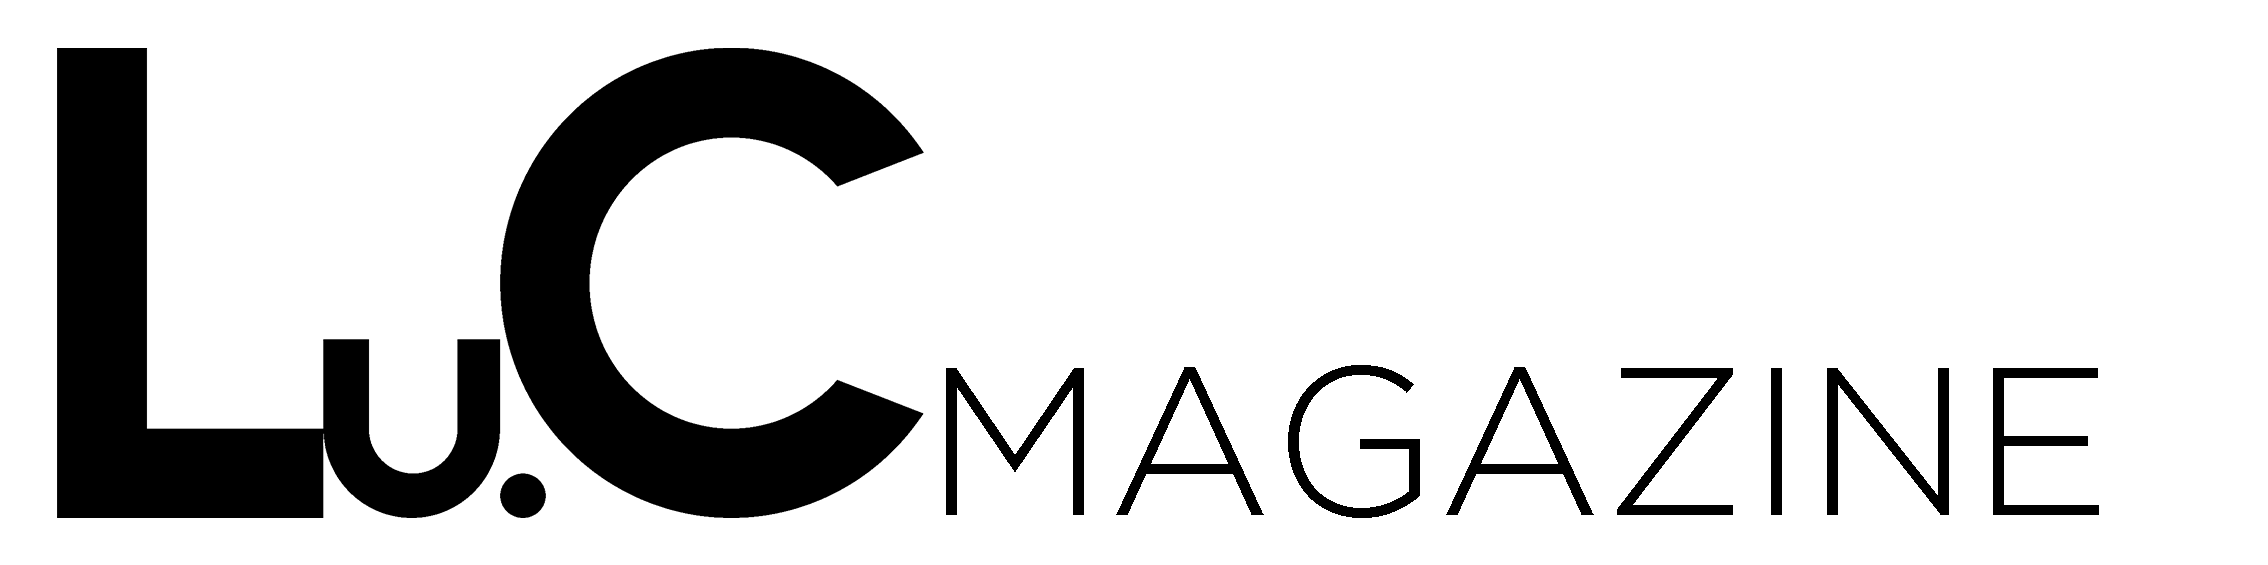 luc magazine logo 2018 b black